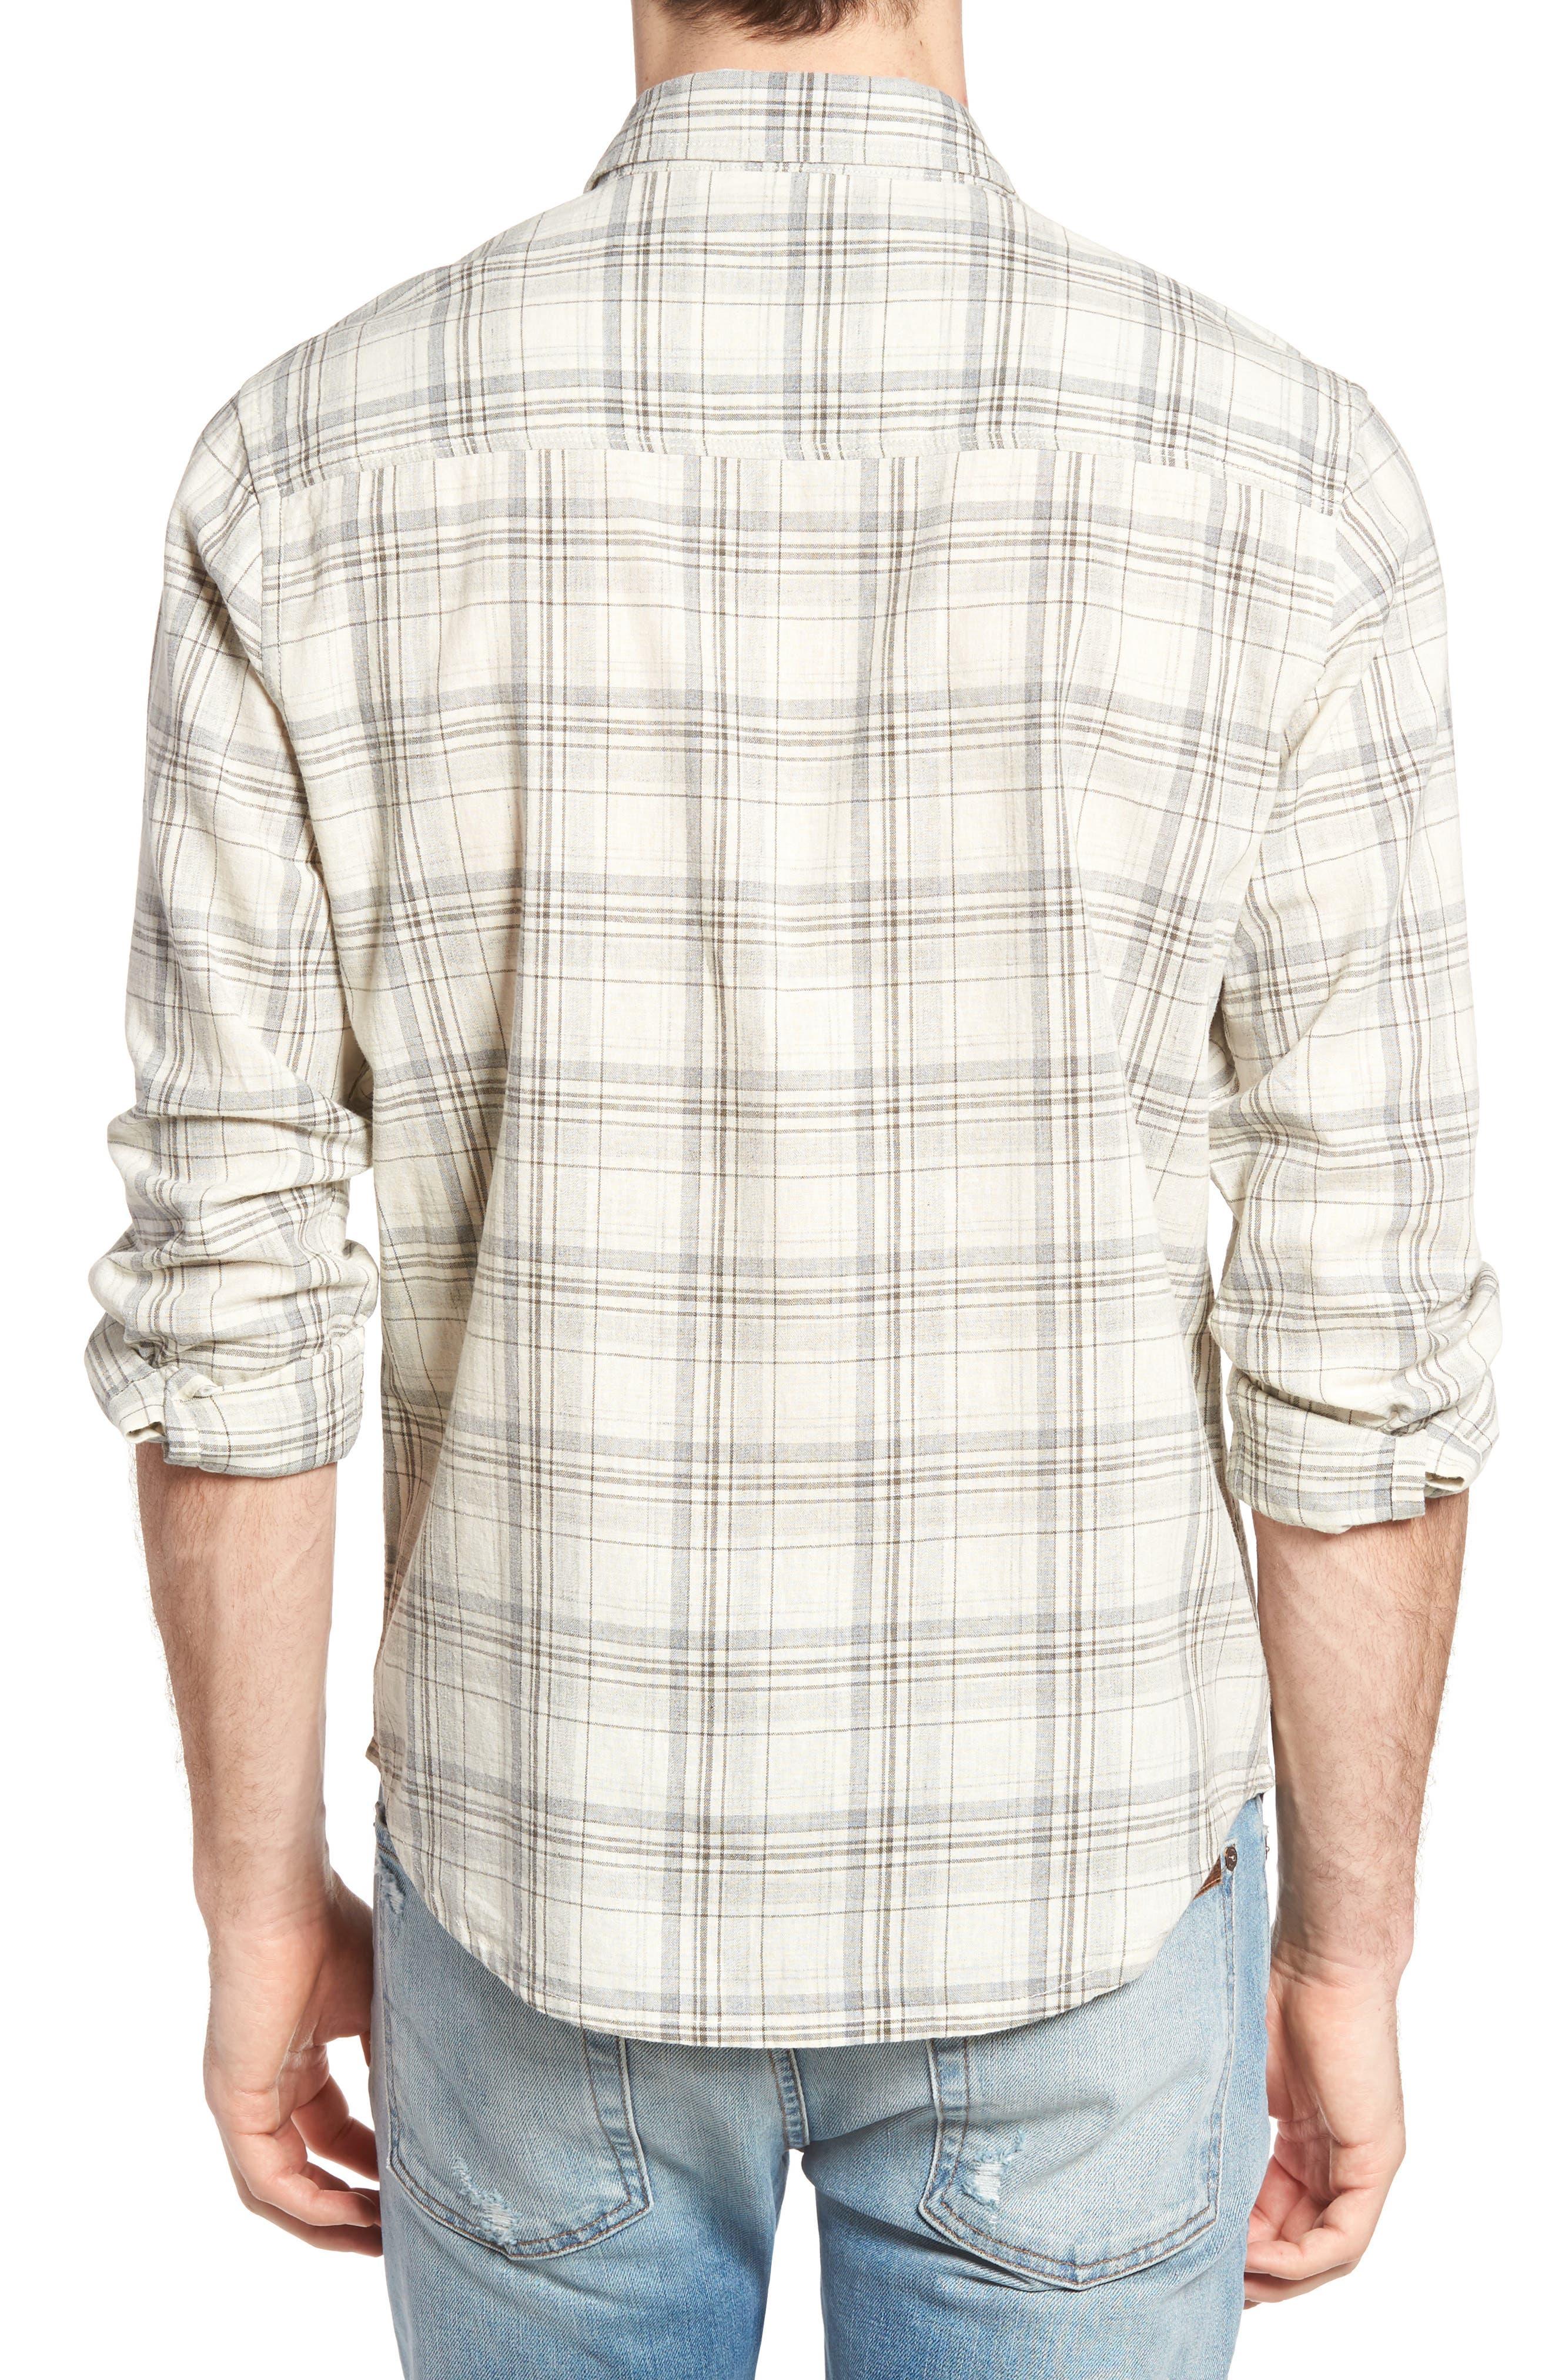 Henri Regular Fit Plaid Cotton & Linen Sport Shirt,                             Alternate thumbnail 2, color,                             280